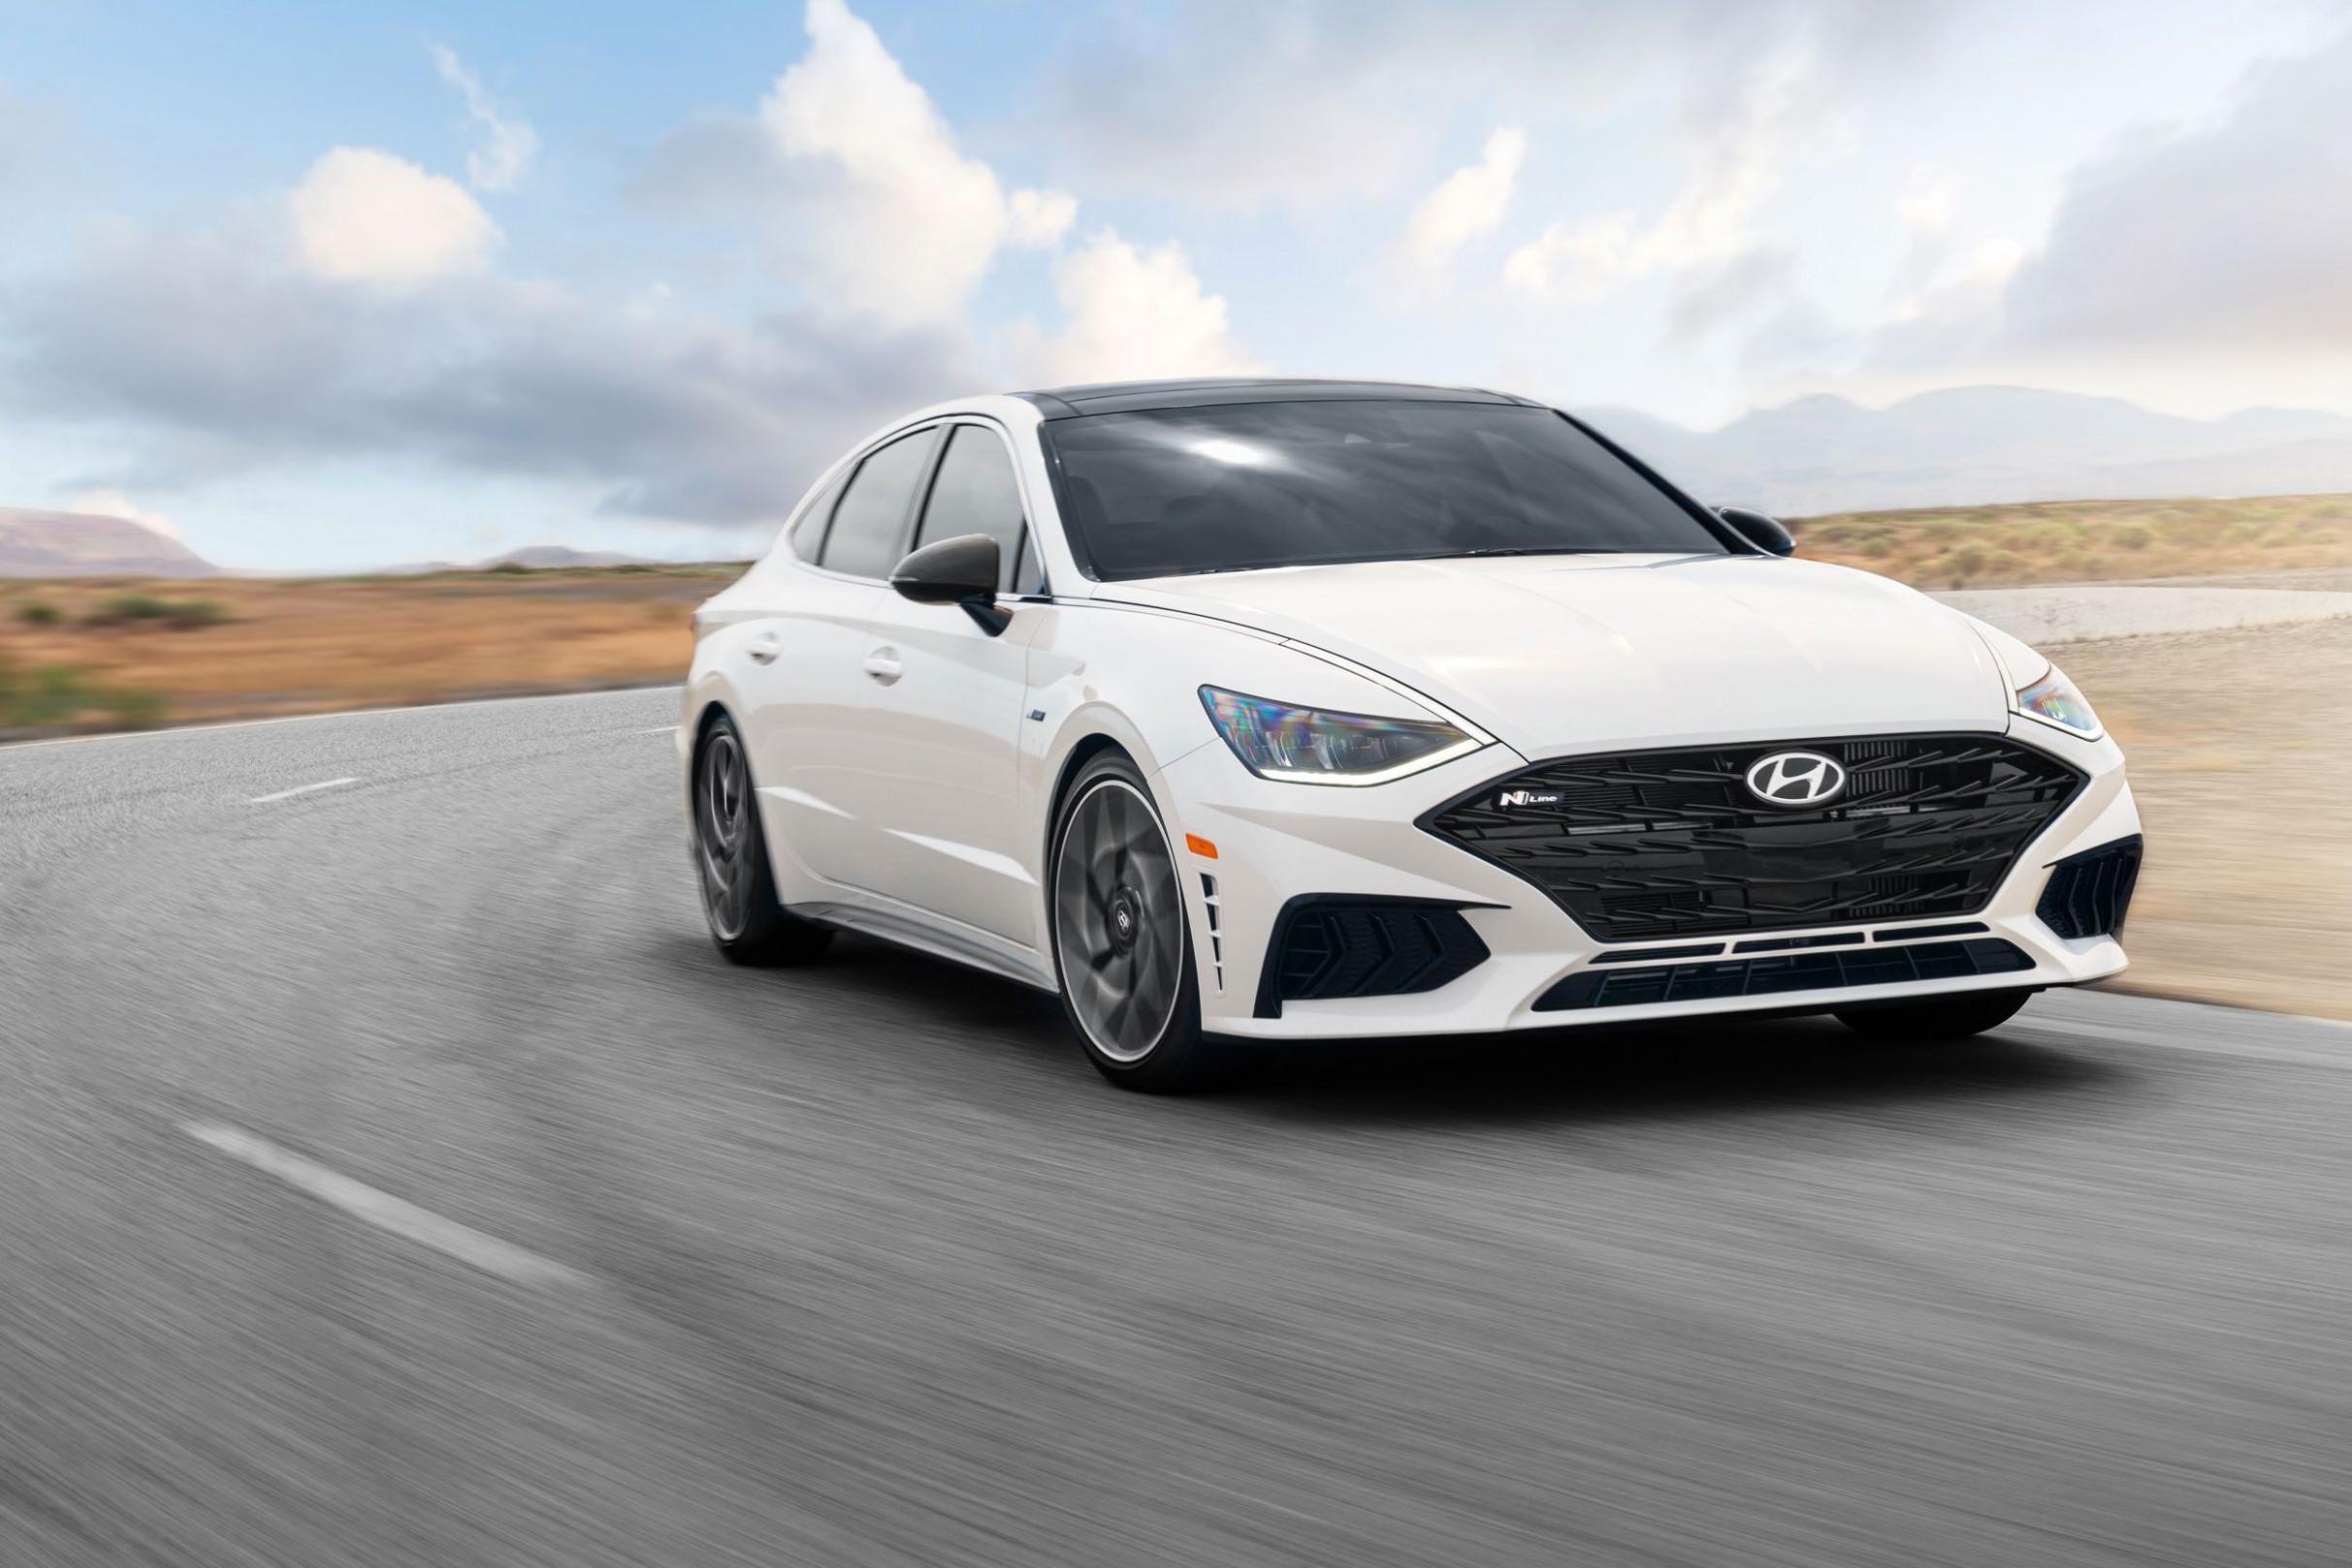 Redesign and Concept 2022 Hyundai Sonata Horsepower